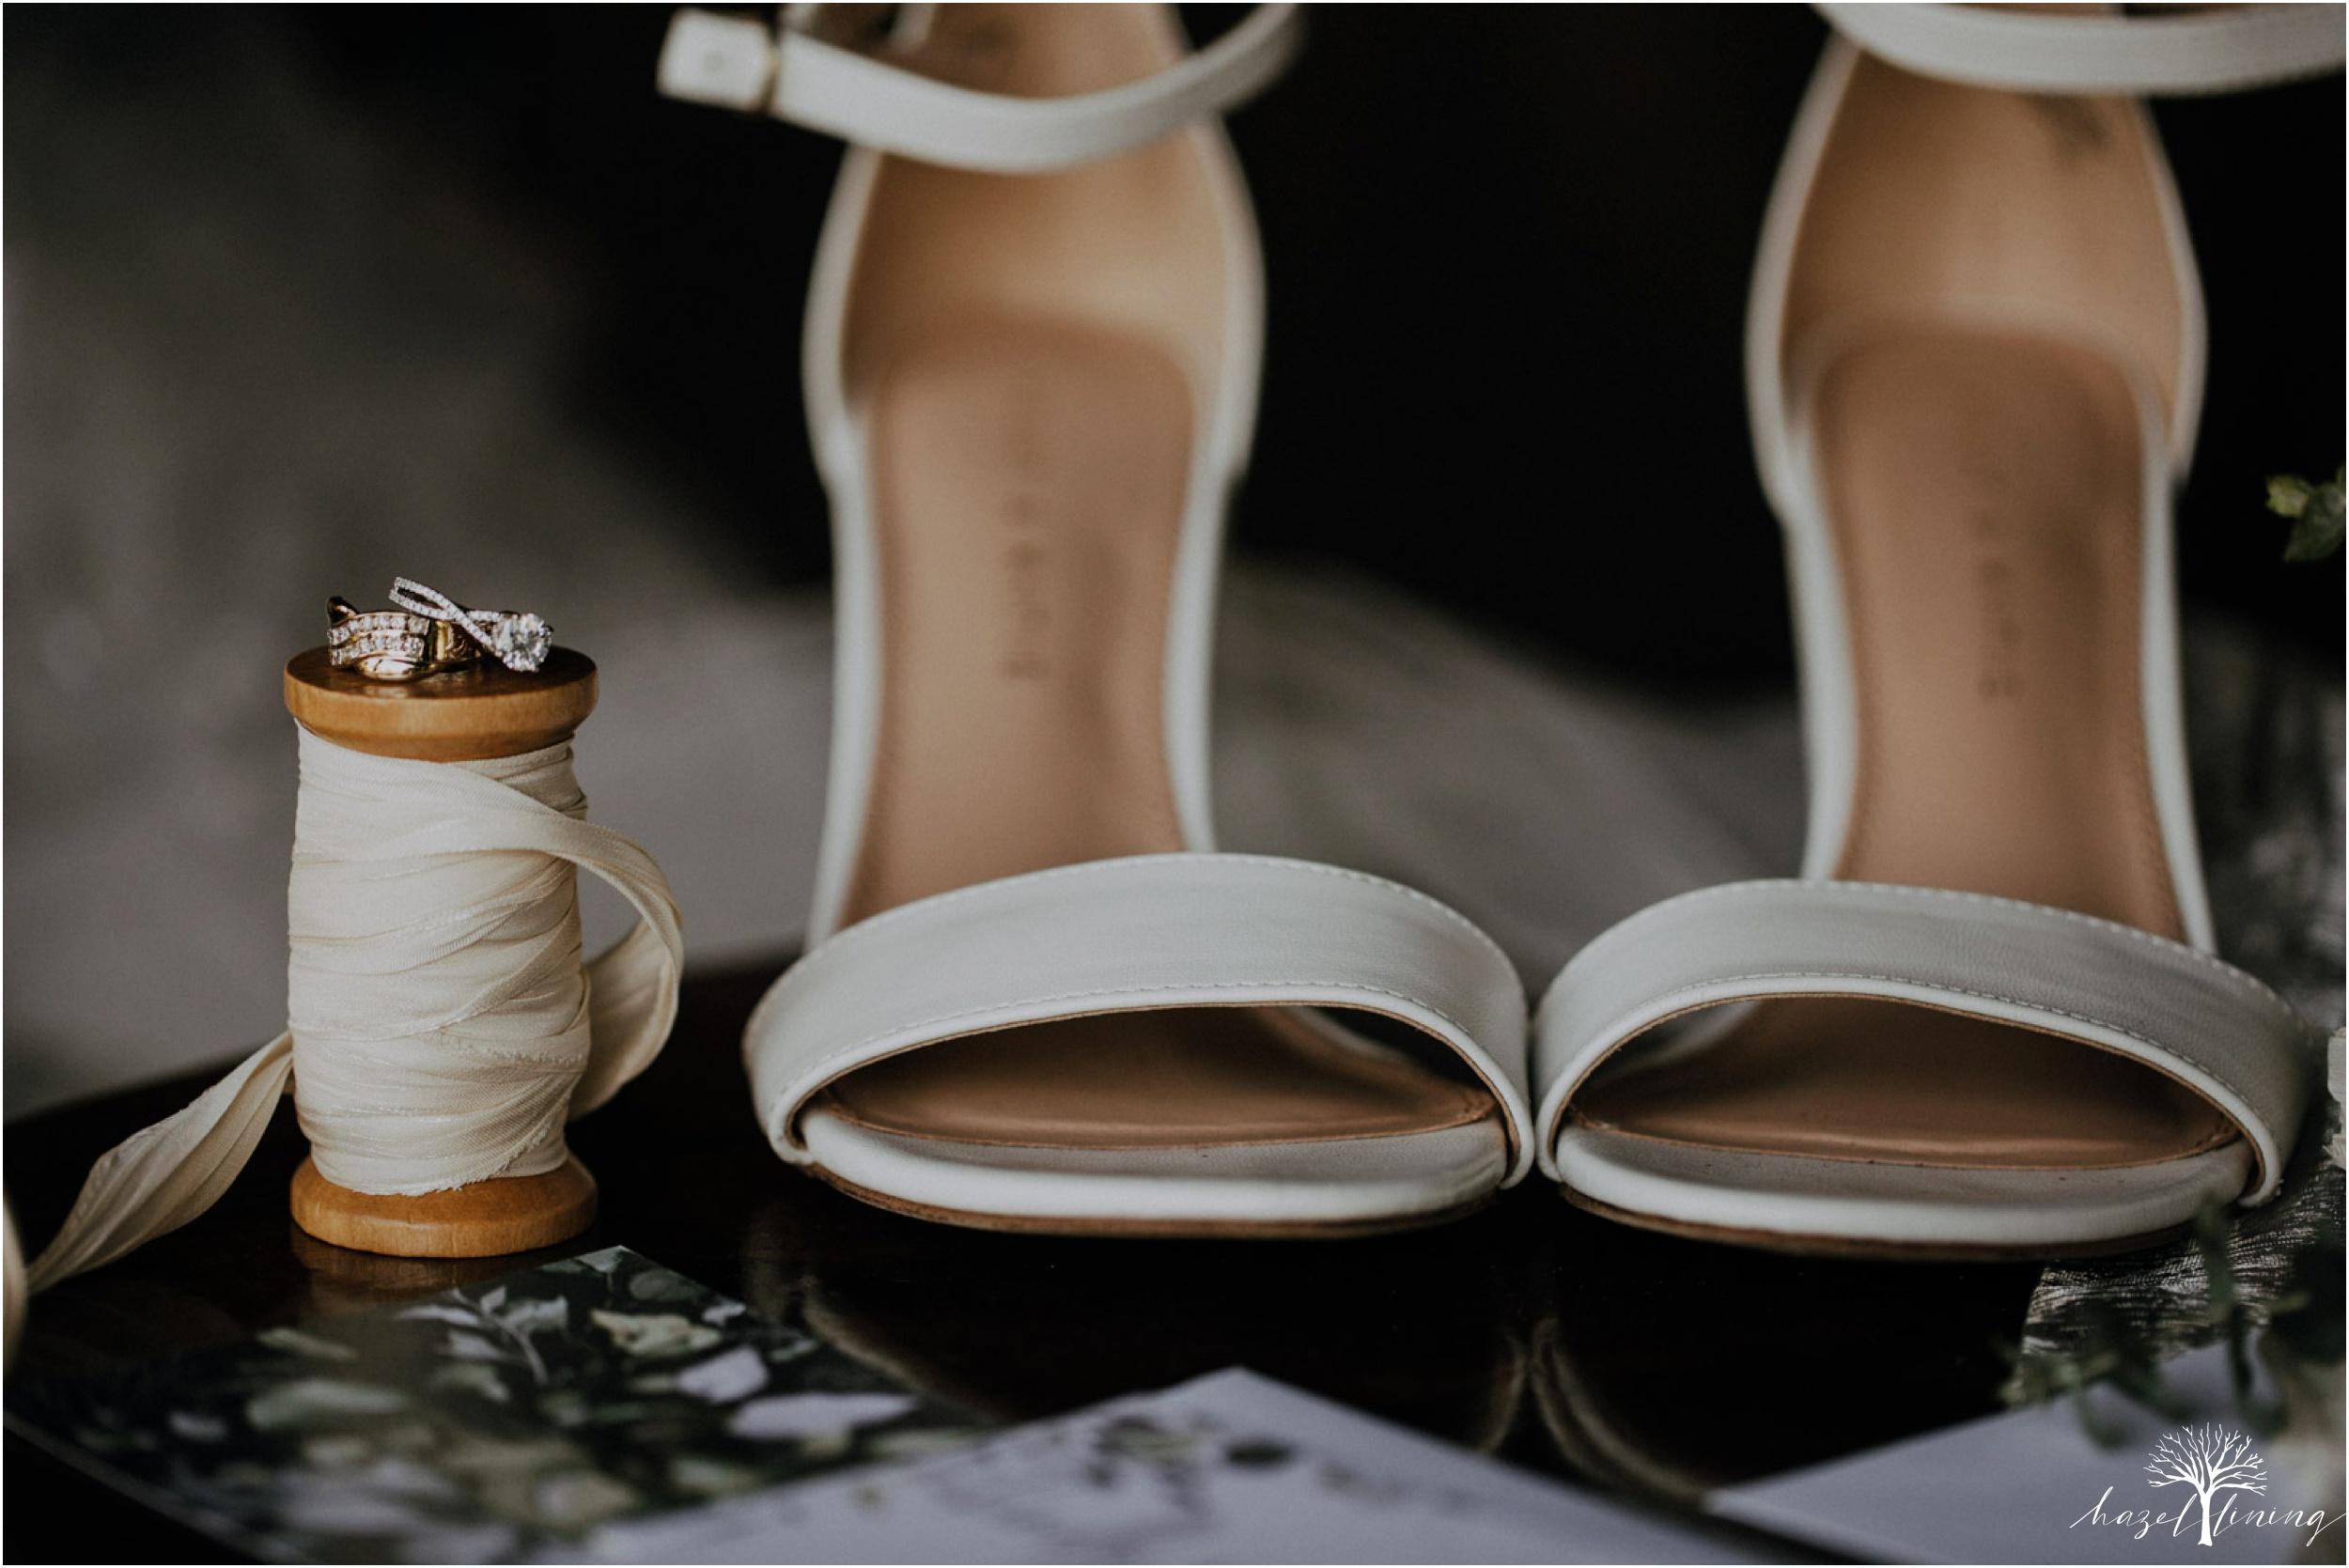 maureen-hepner-anthony-giordano-rose-bank-winery-newtow-pennsylvania-luxury-summer-wedding-hazel-lining-photography-destination-elopement-wedding-engagement-photography_0009.jpg